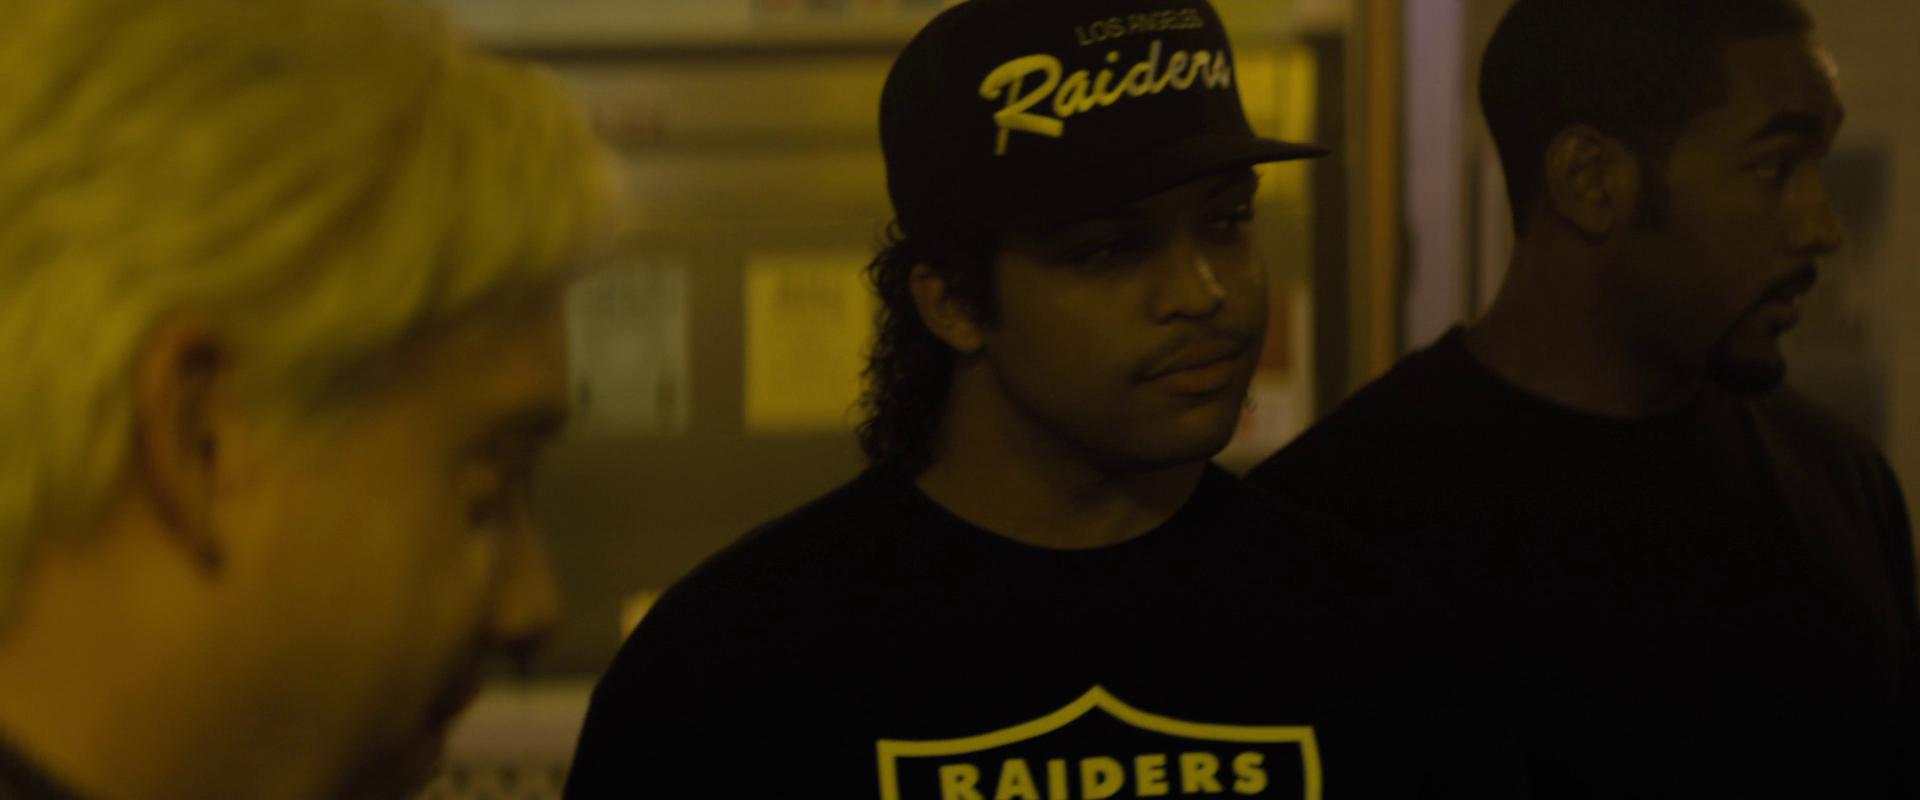 Straight Outta Compton 2015 (1080p Bluray) DUAL TR - EN - Full HD Film indir